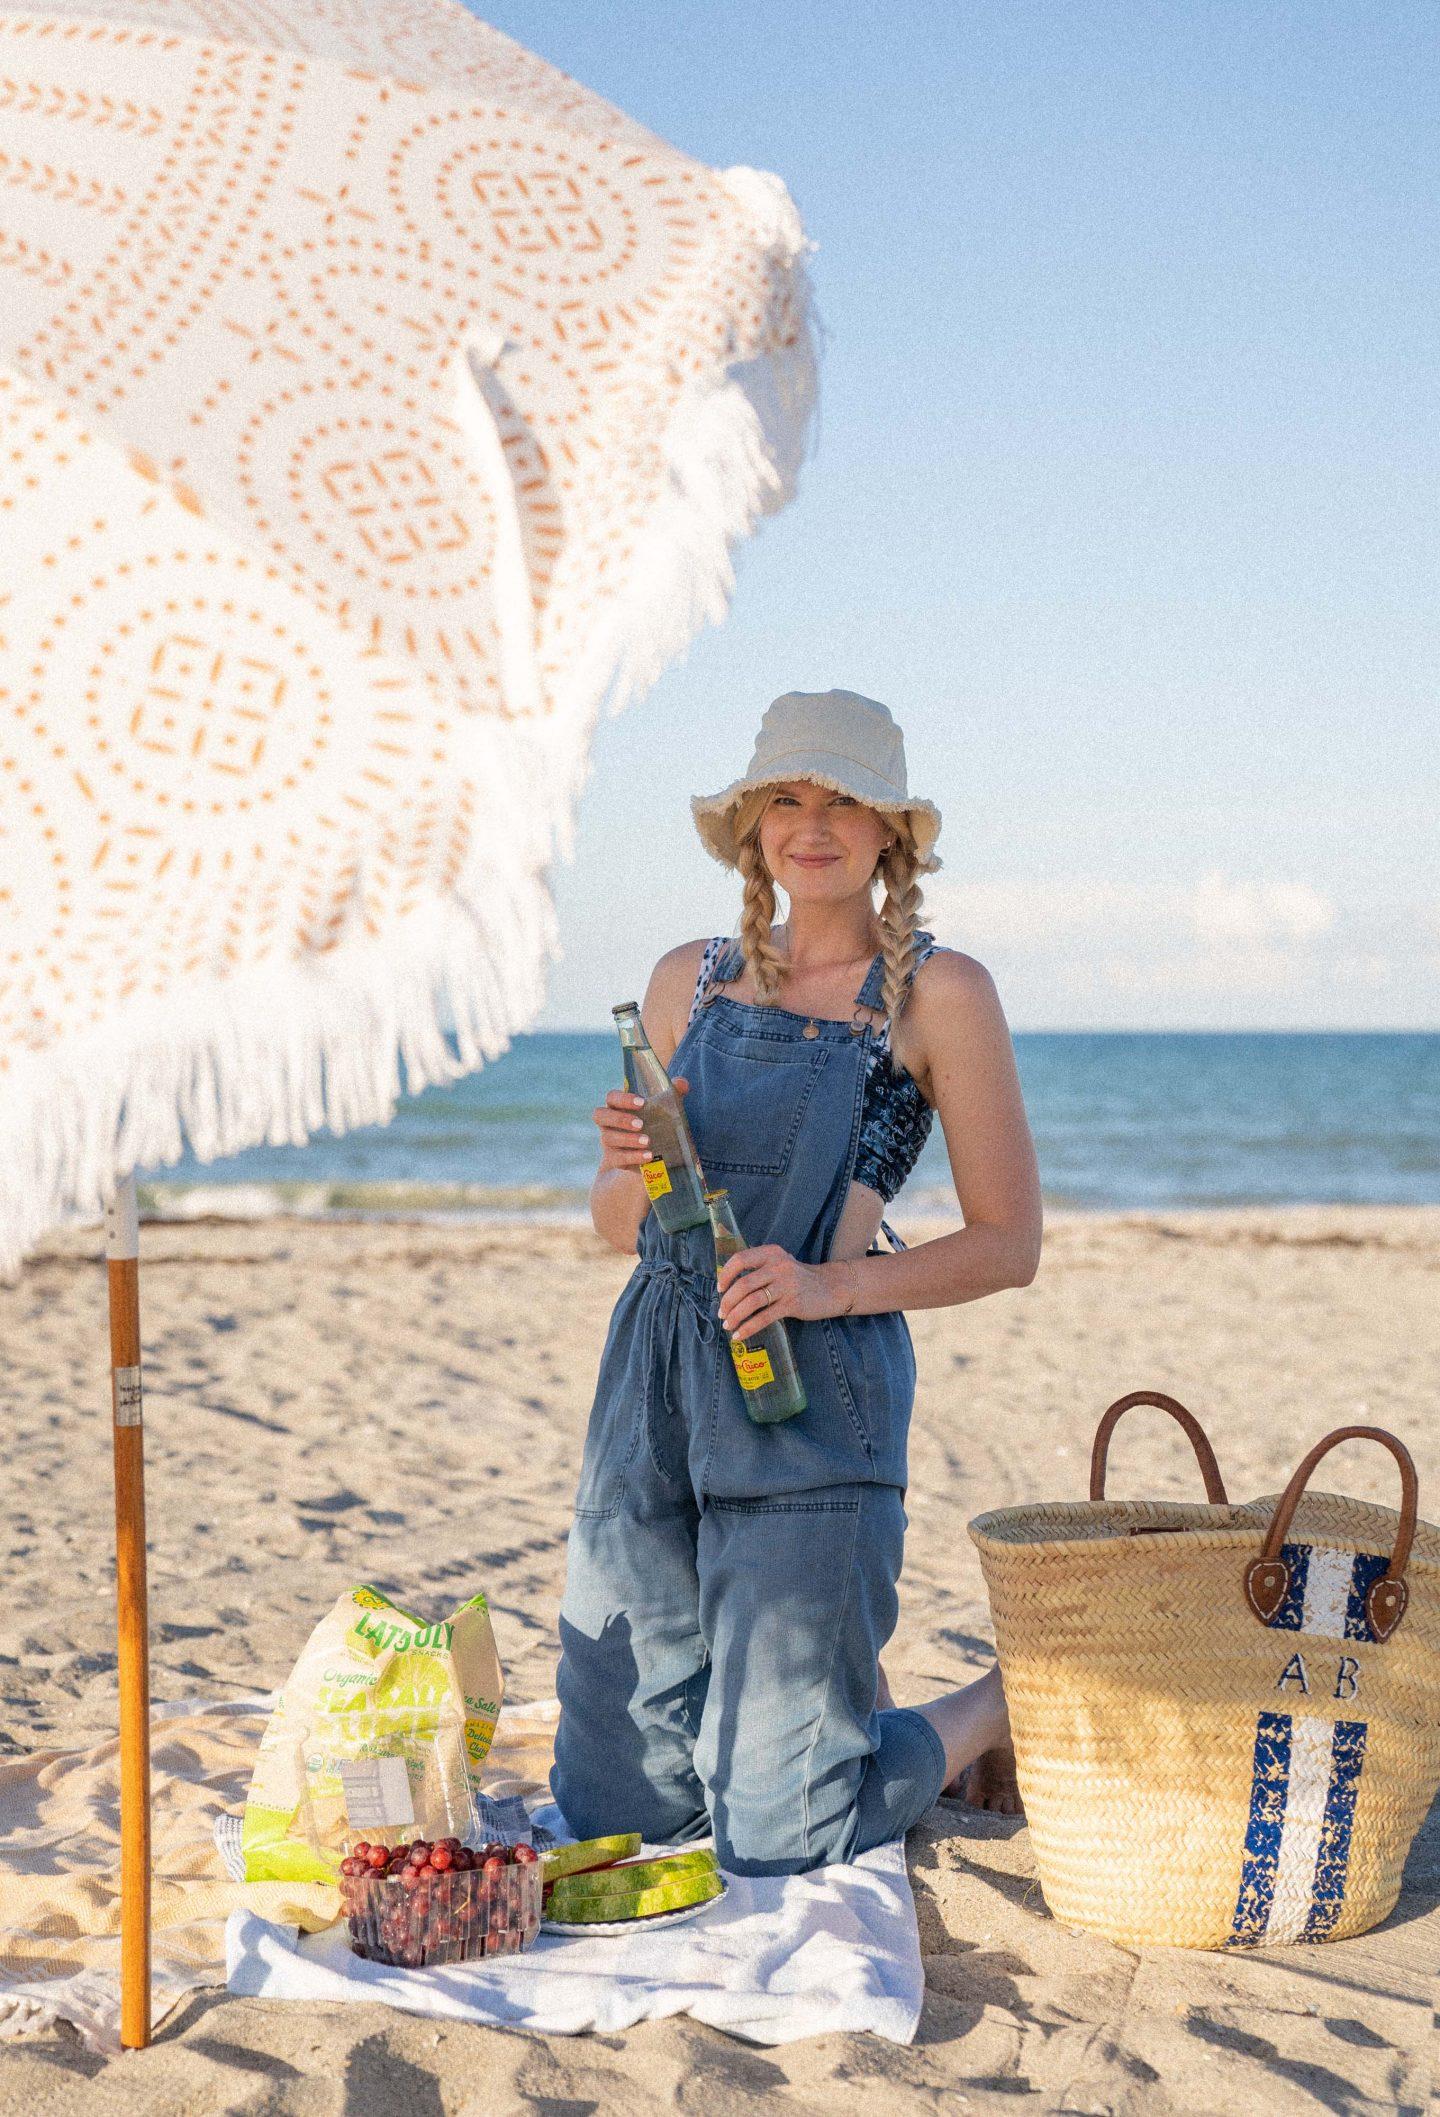 Impromptu Beach Picnic with Walmart+